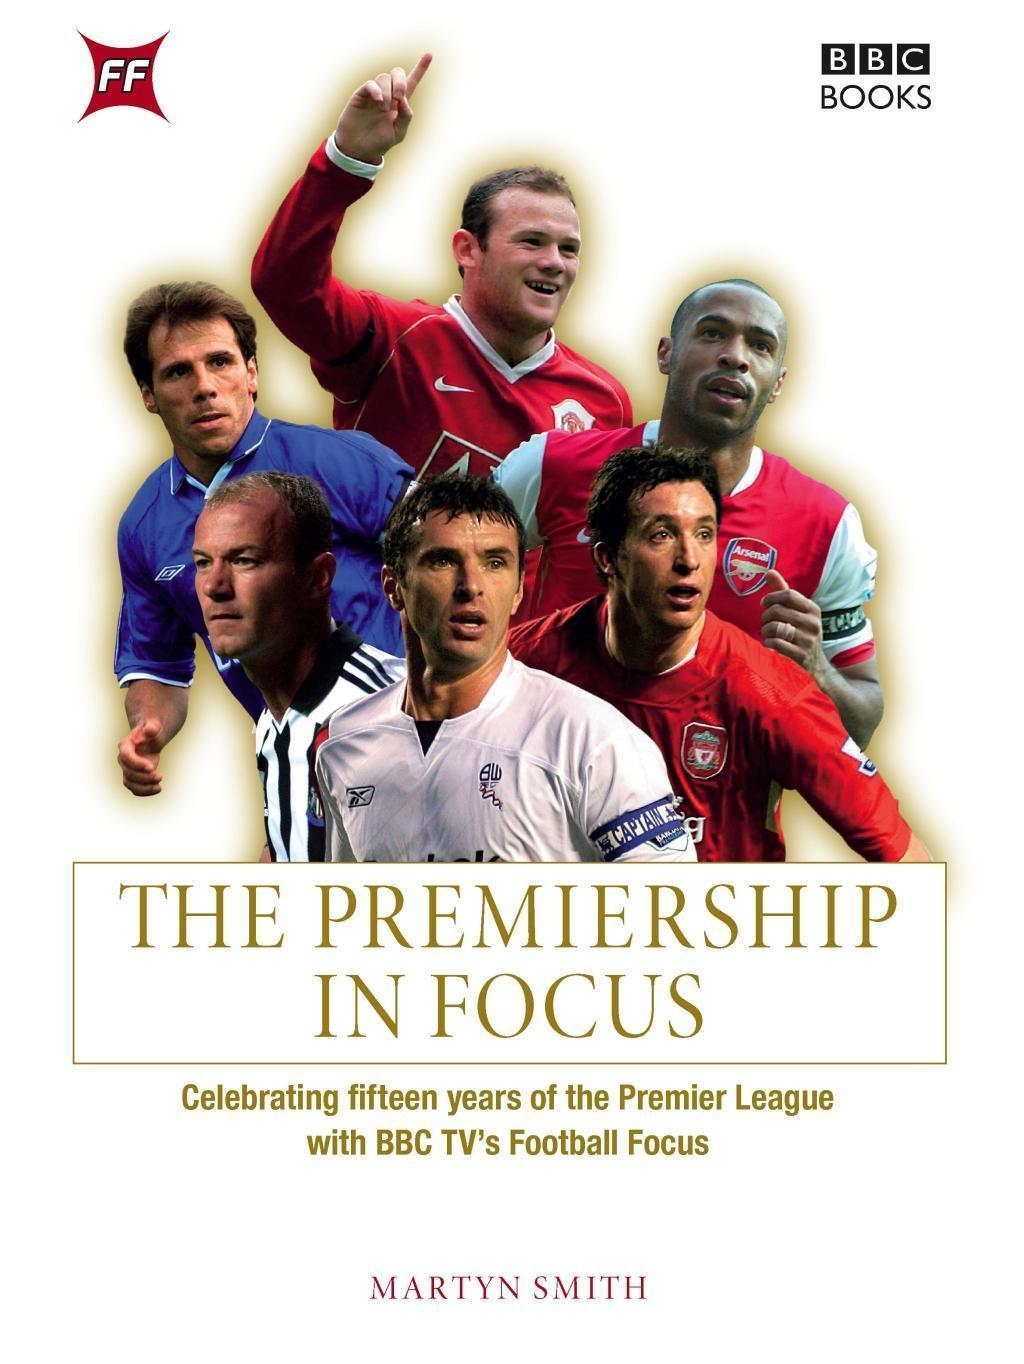 The Premiership in Focus